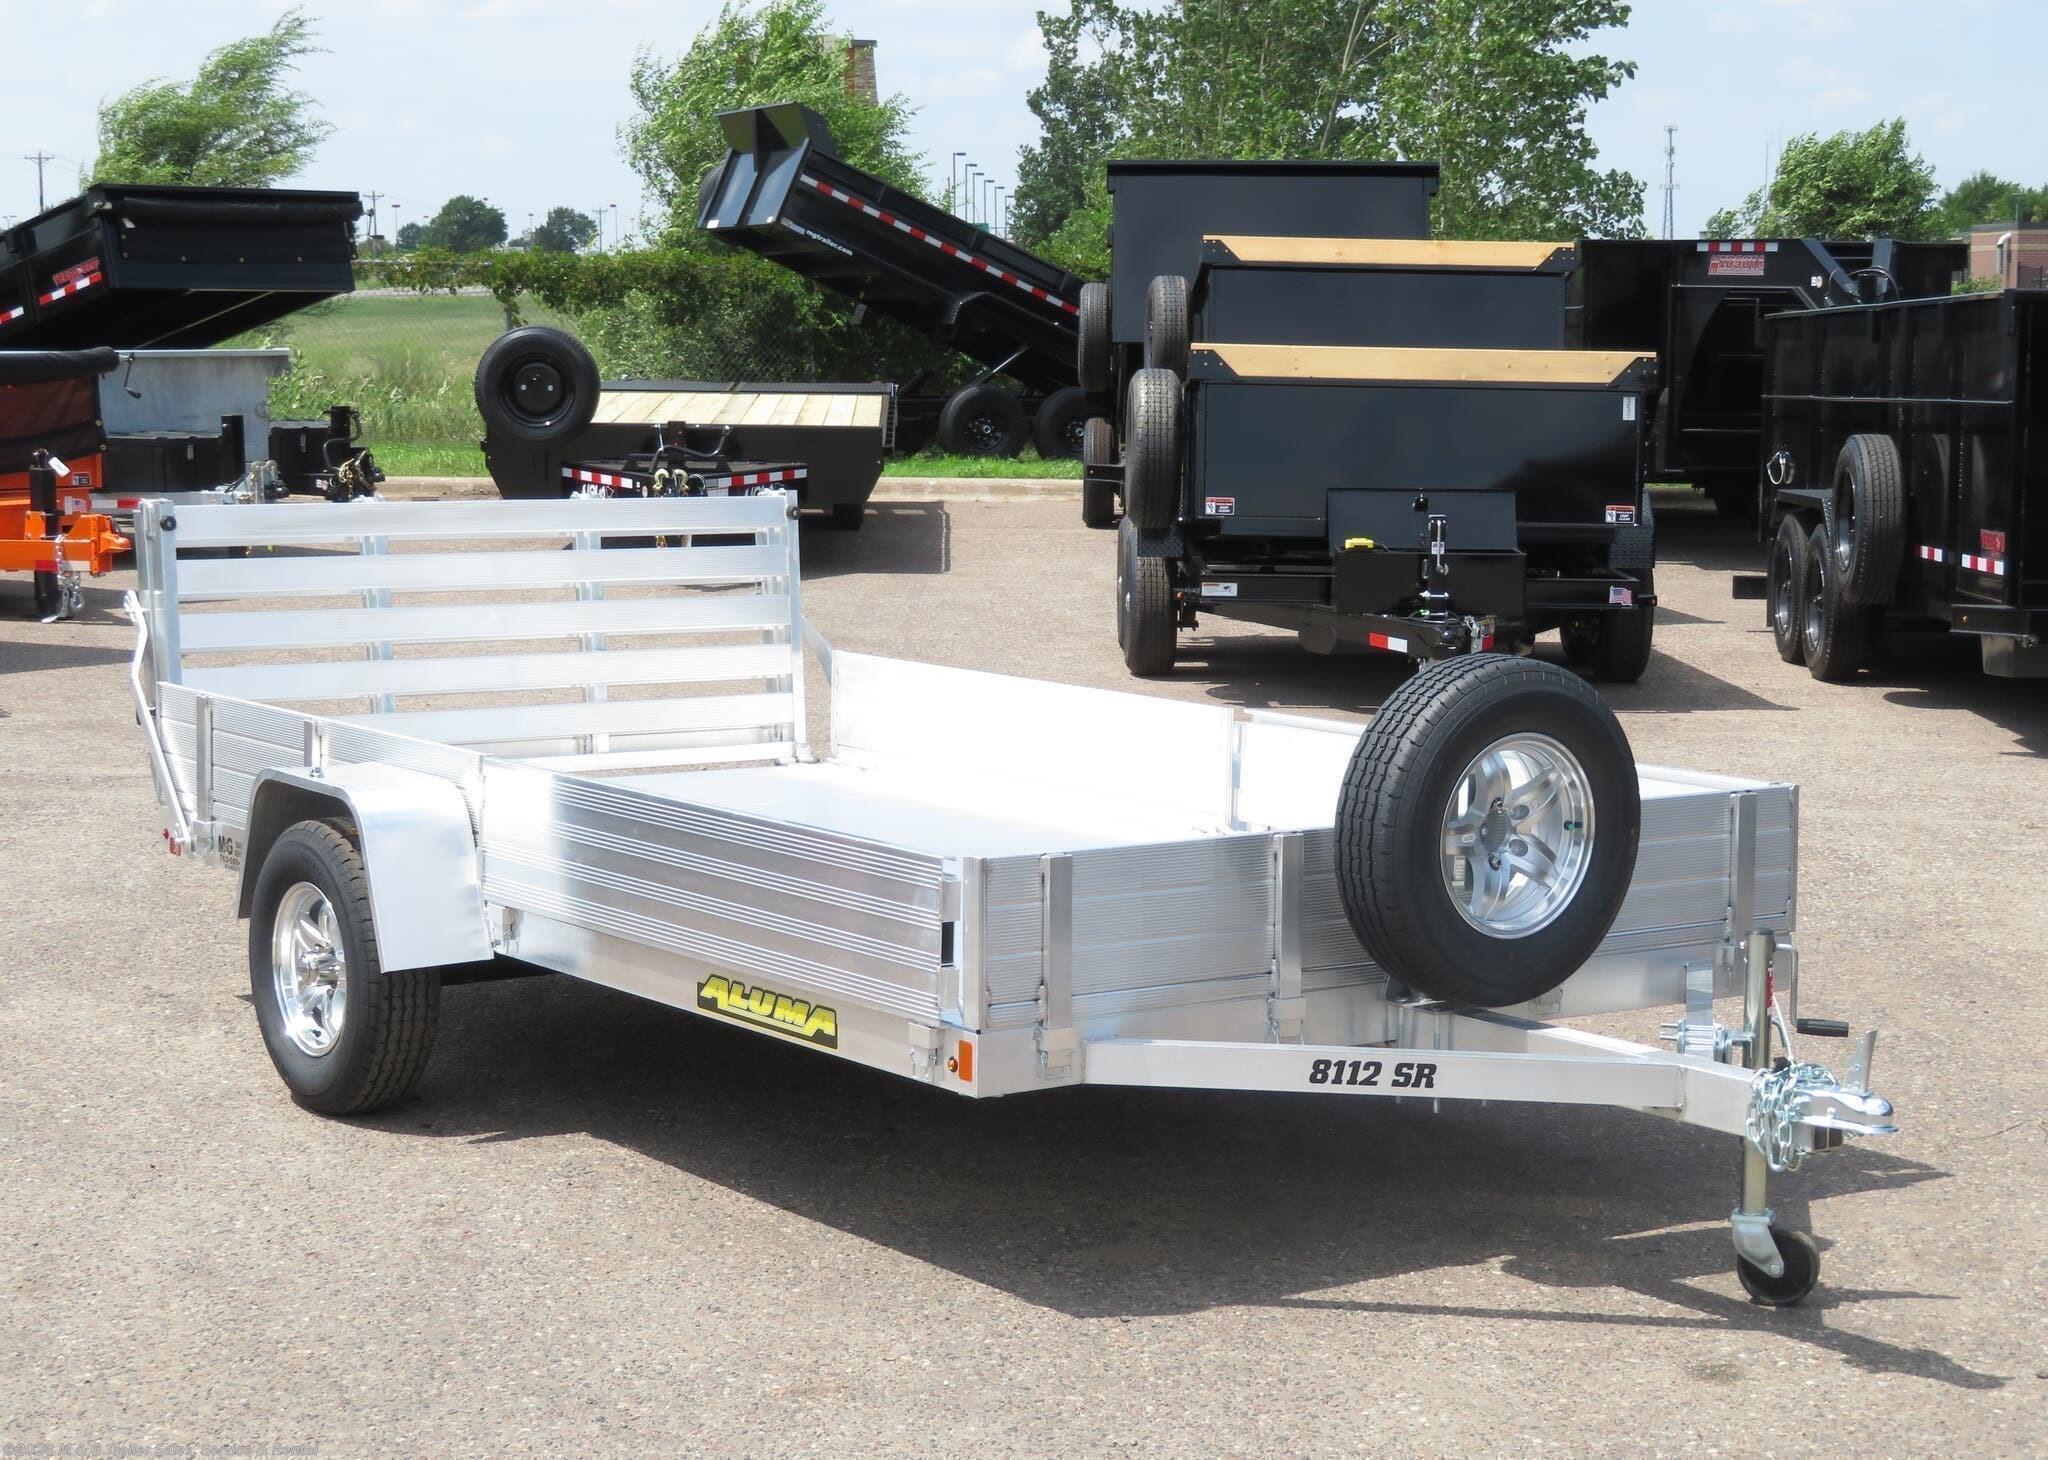 2022 Aluma 8112 SR Aluminum ATV/Utility Trailer - Stock #230123